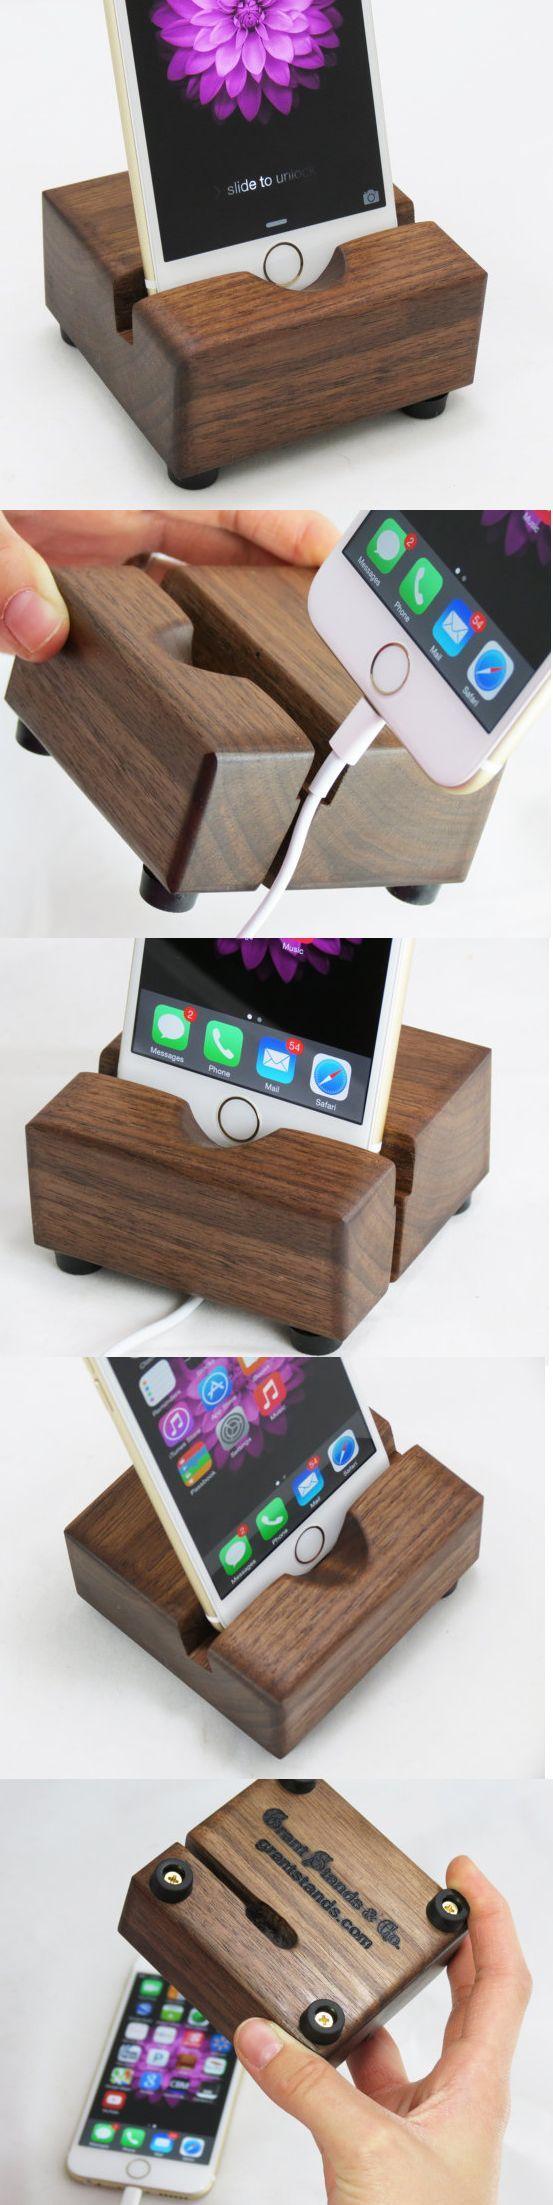 iPhone 6 Docking Station - Black Walnut                                                                                                                                                     More